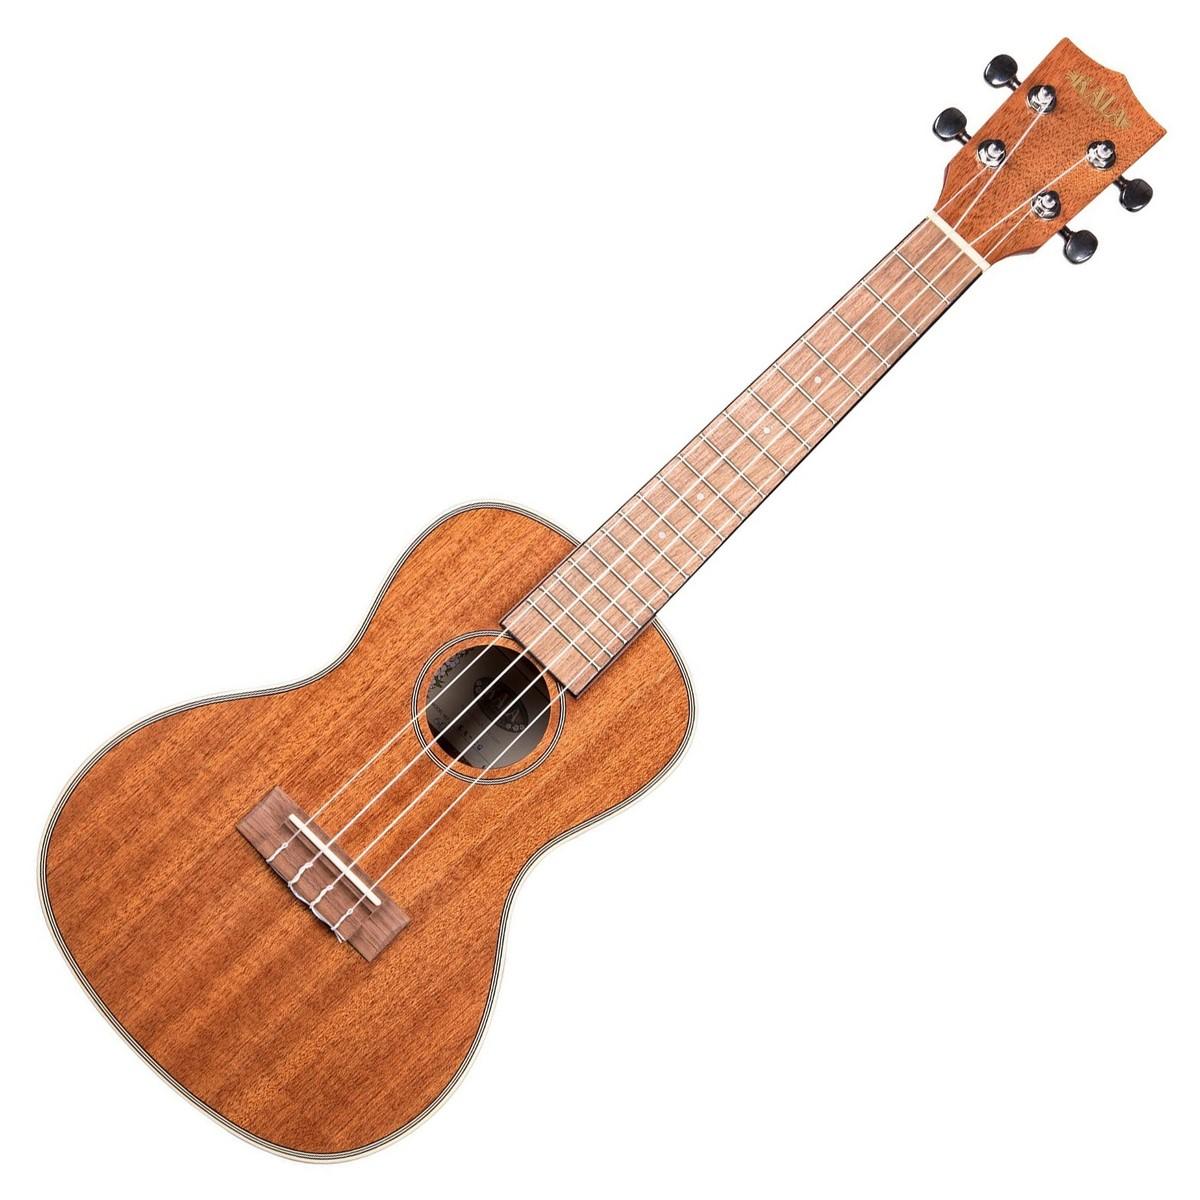 Kala Ka Cg : kala ka cg concert ukulele gloss natural at gear4music ~ Vivirlamusica.com Haus und Dekorationen